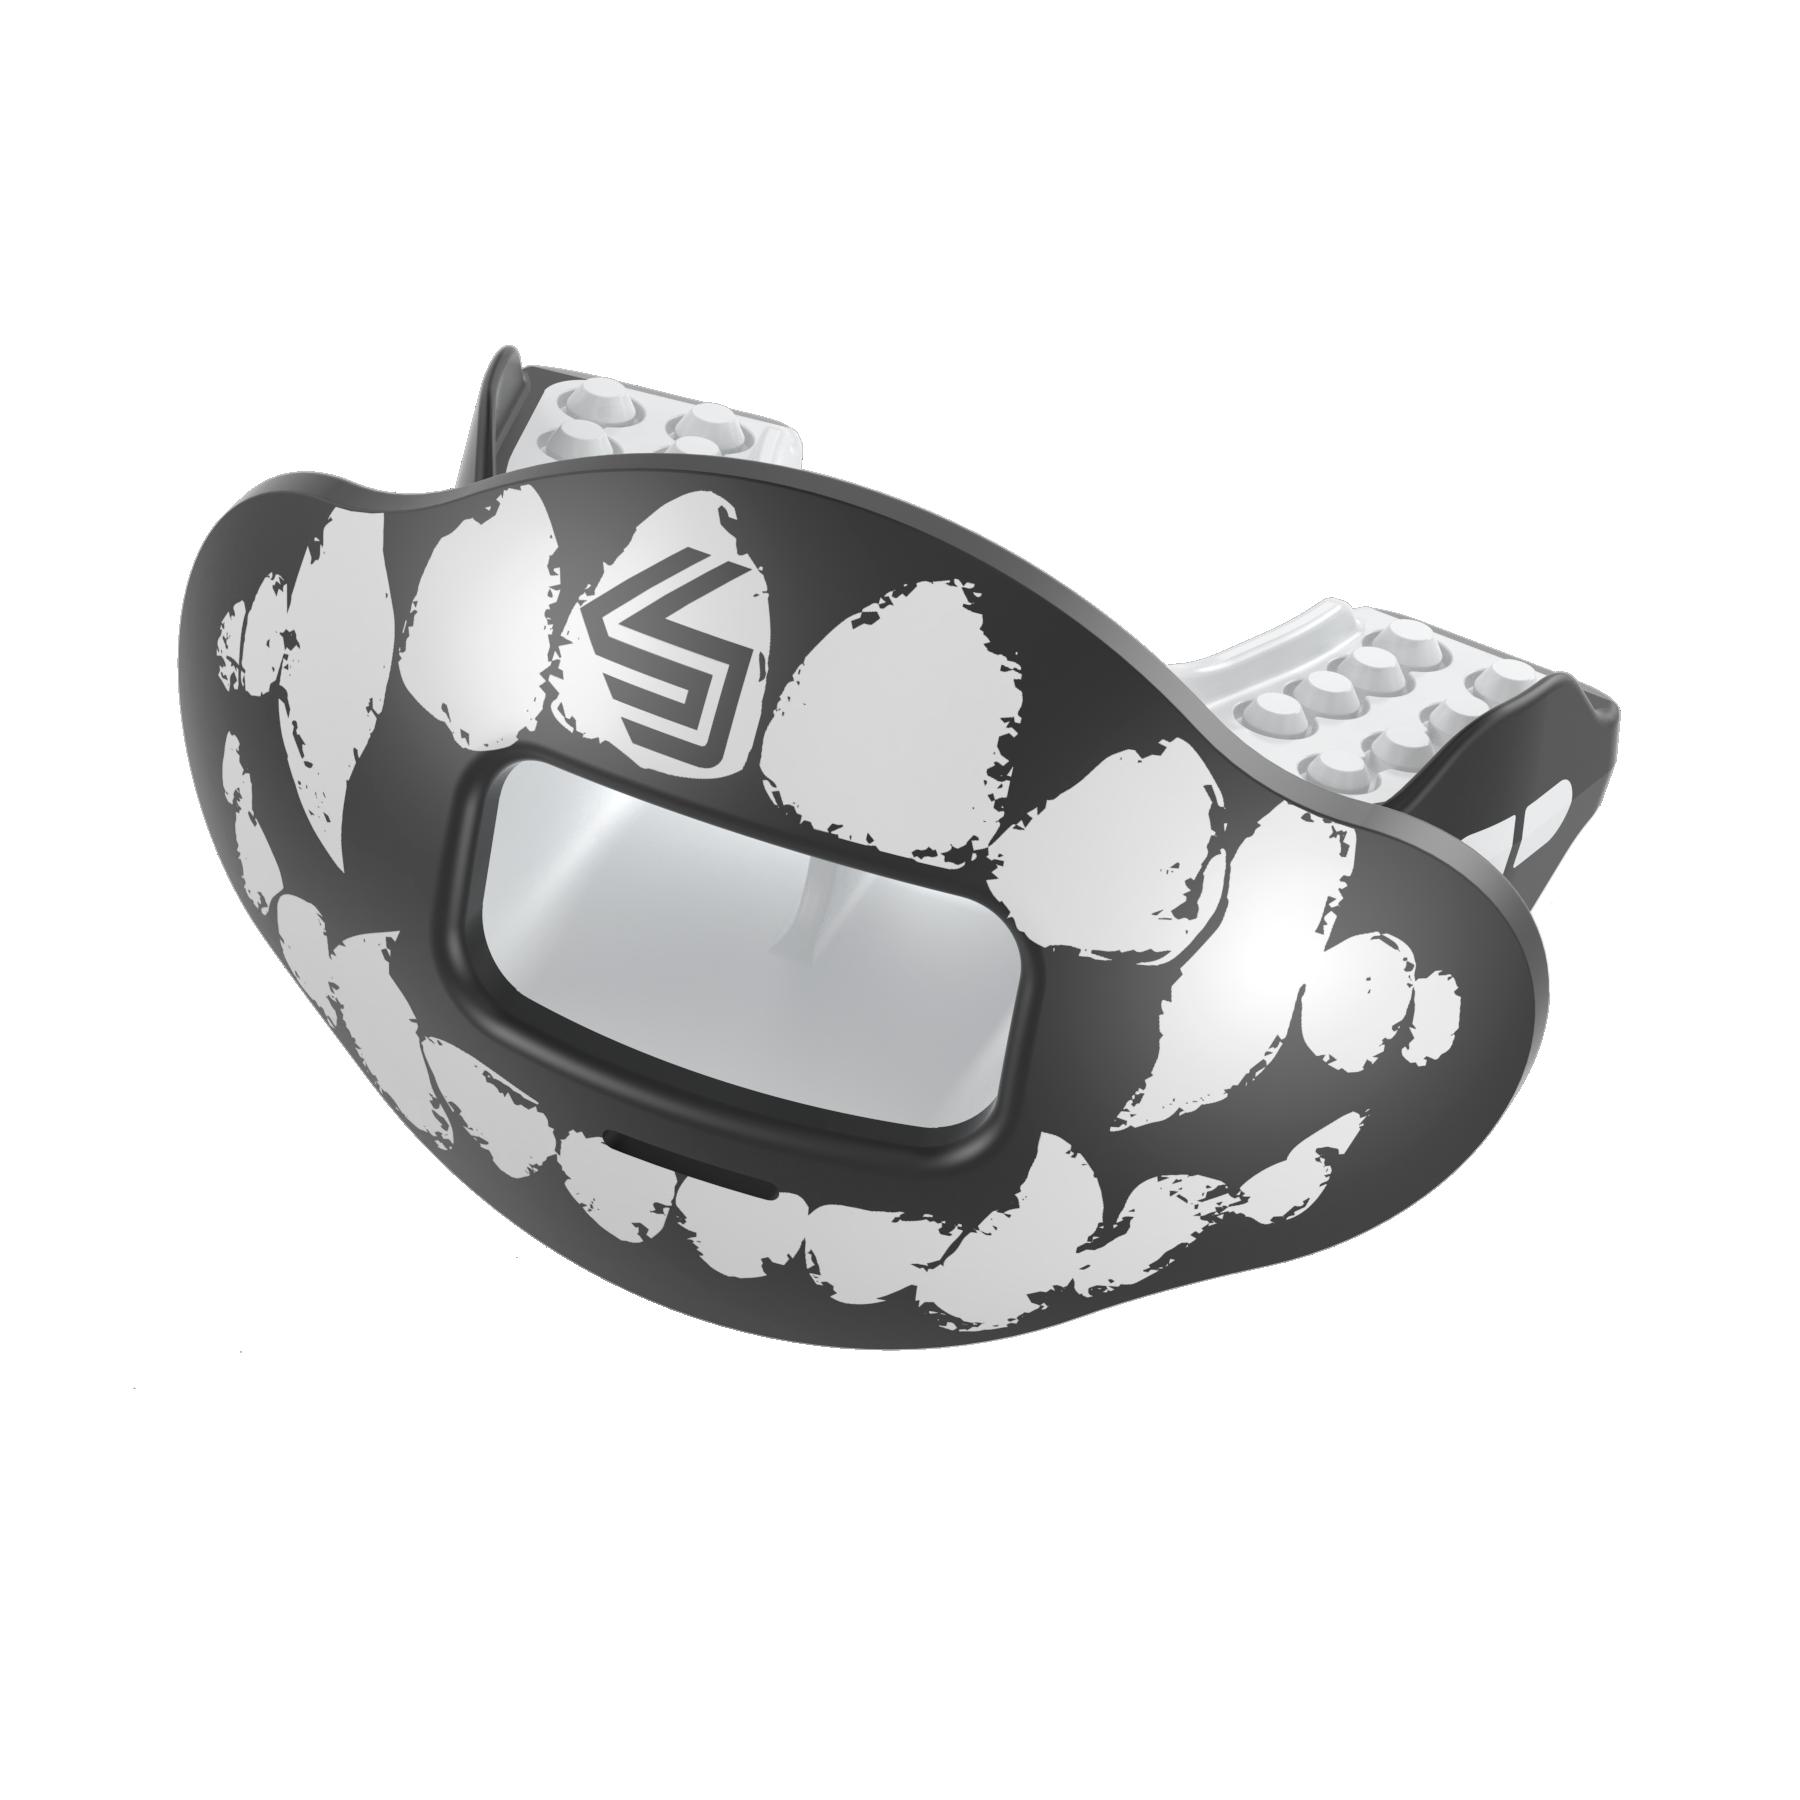 SHOCK DOCTOR Max AirFlow 2.0 Lip Guard Conv Blk/Wht Fang OSFA (3) OSFA